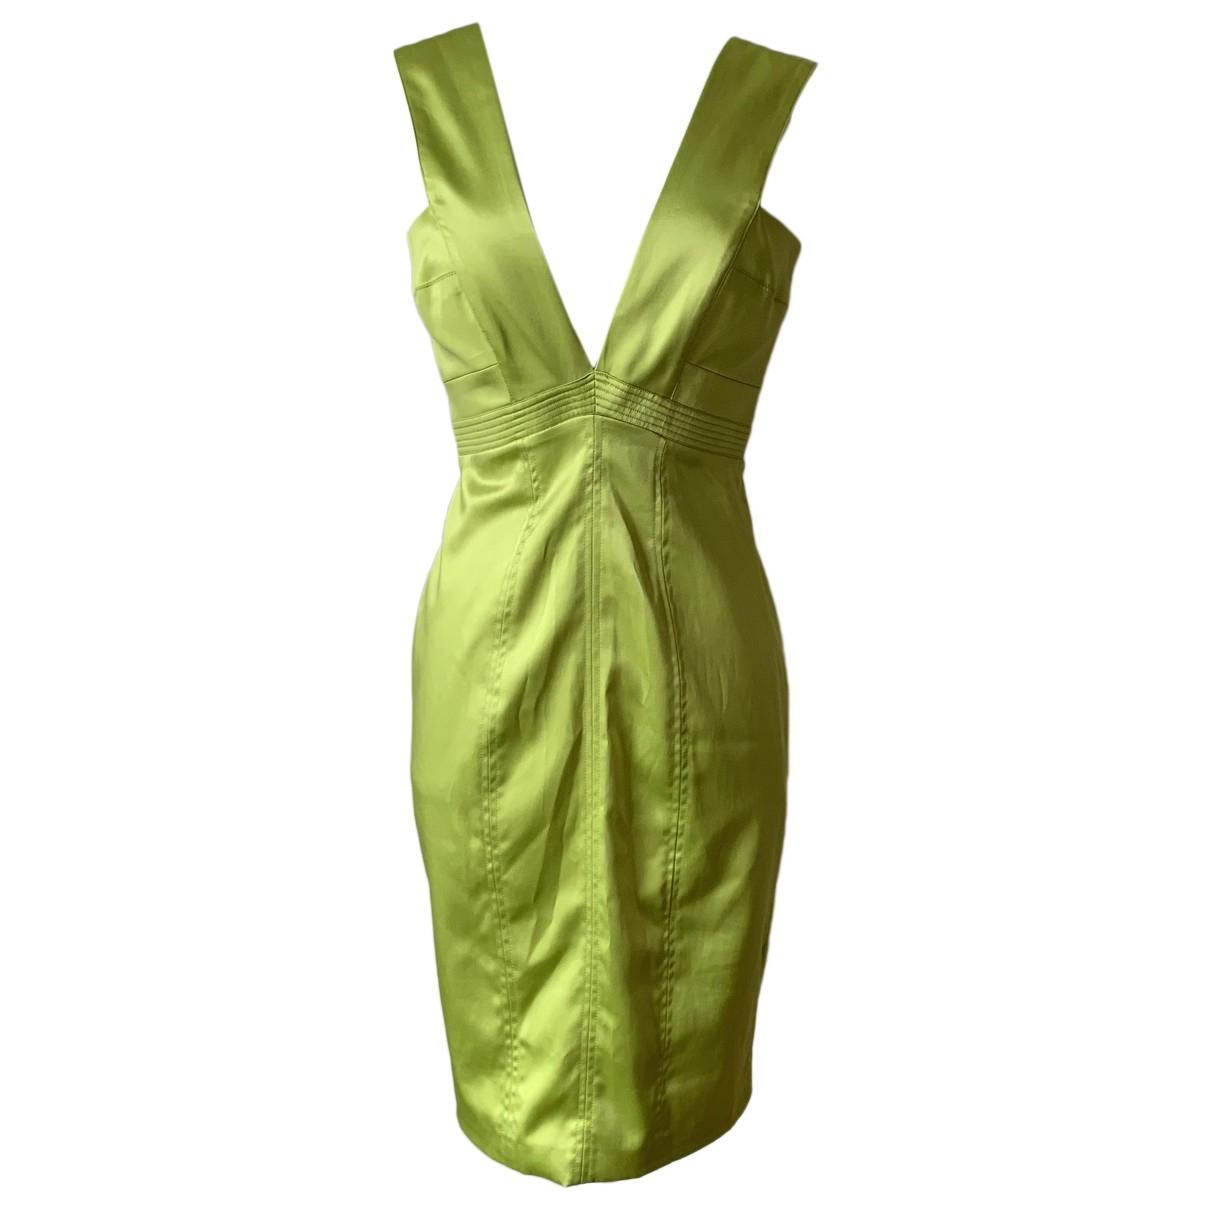 Just Cavalli \N Green dress for Women 40 IT